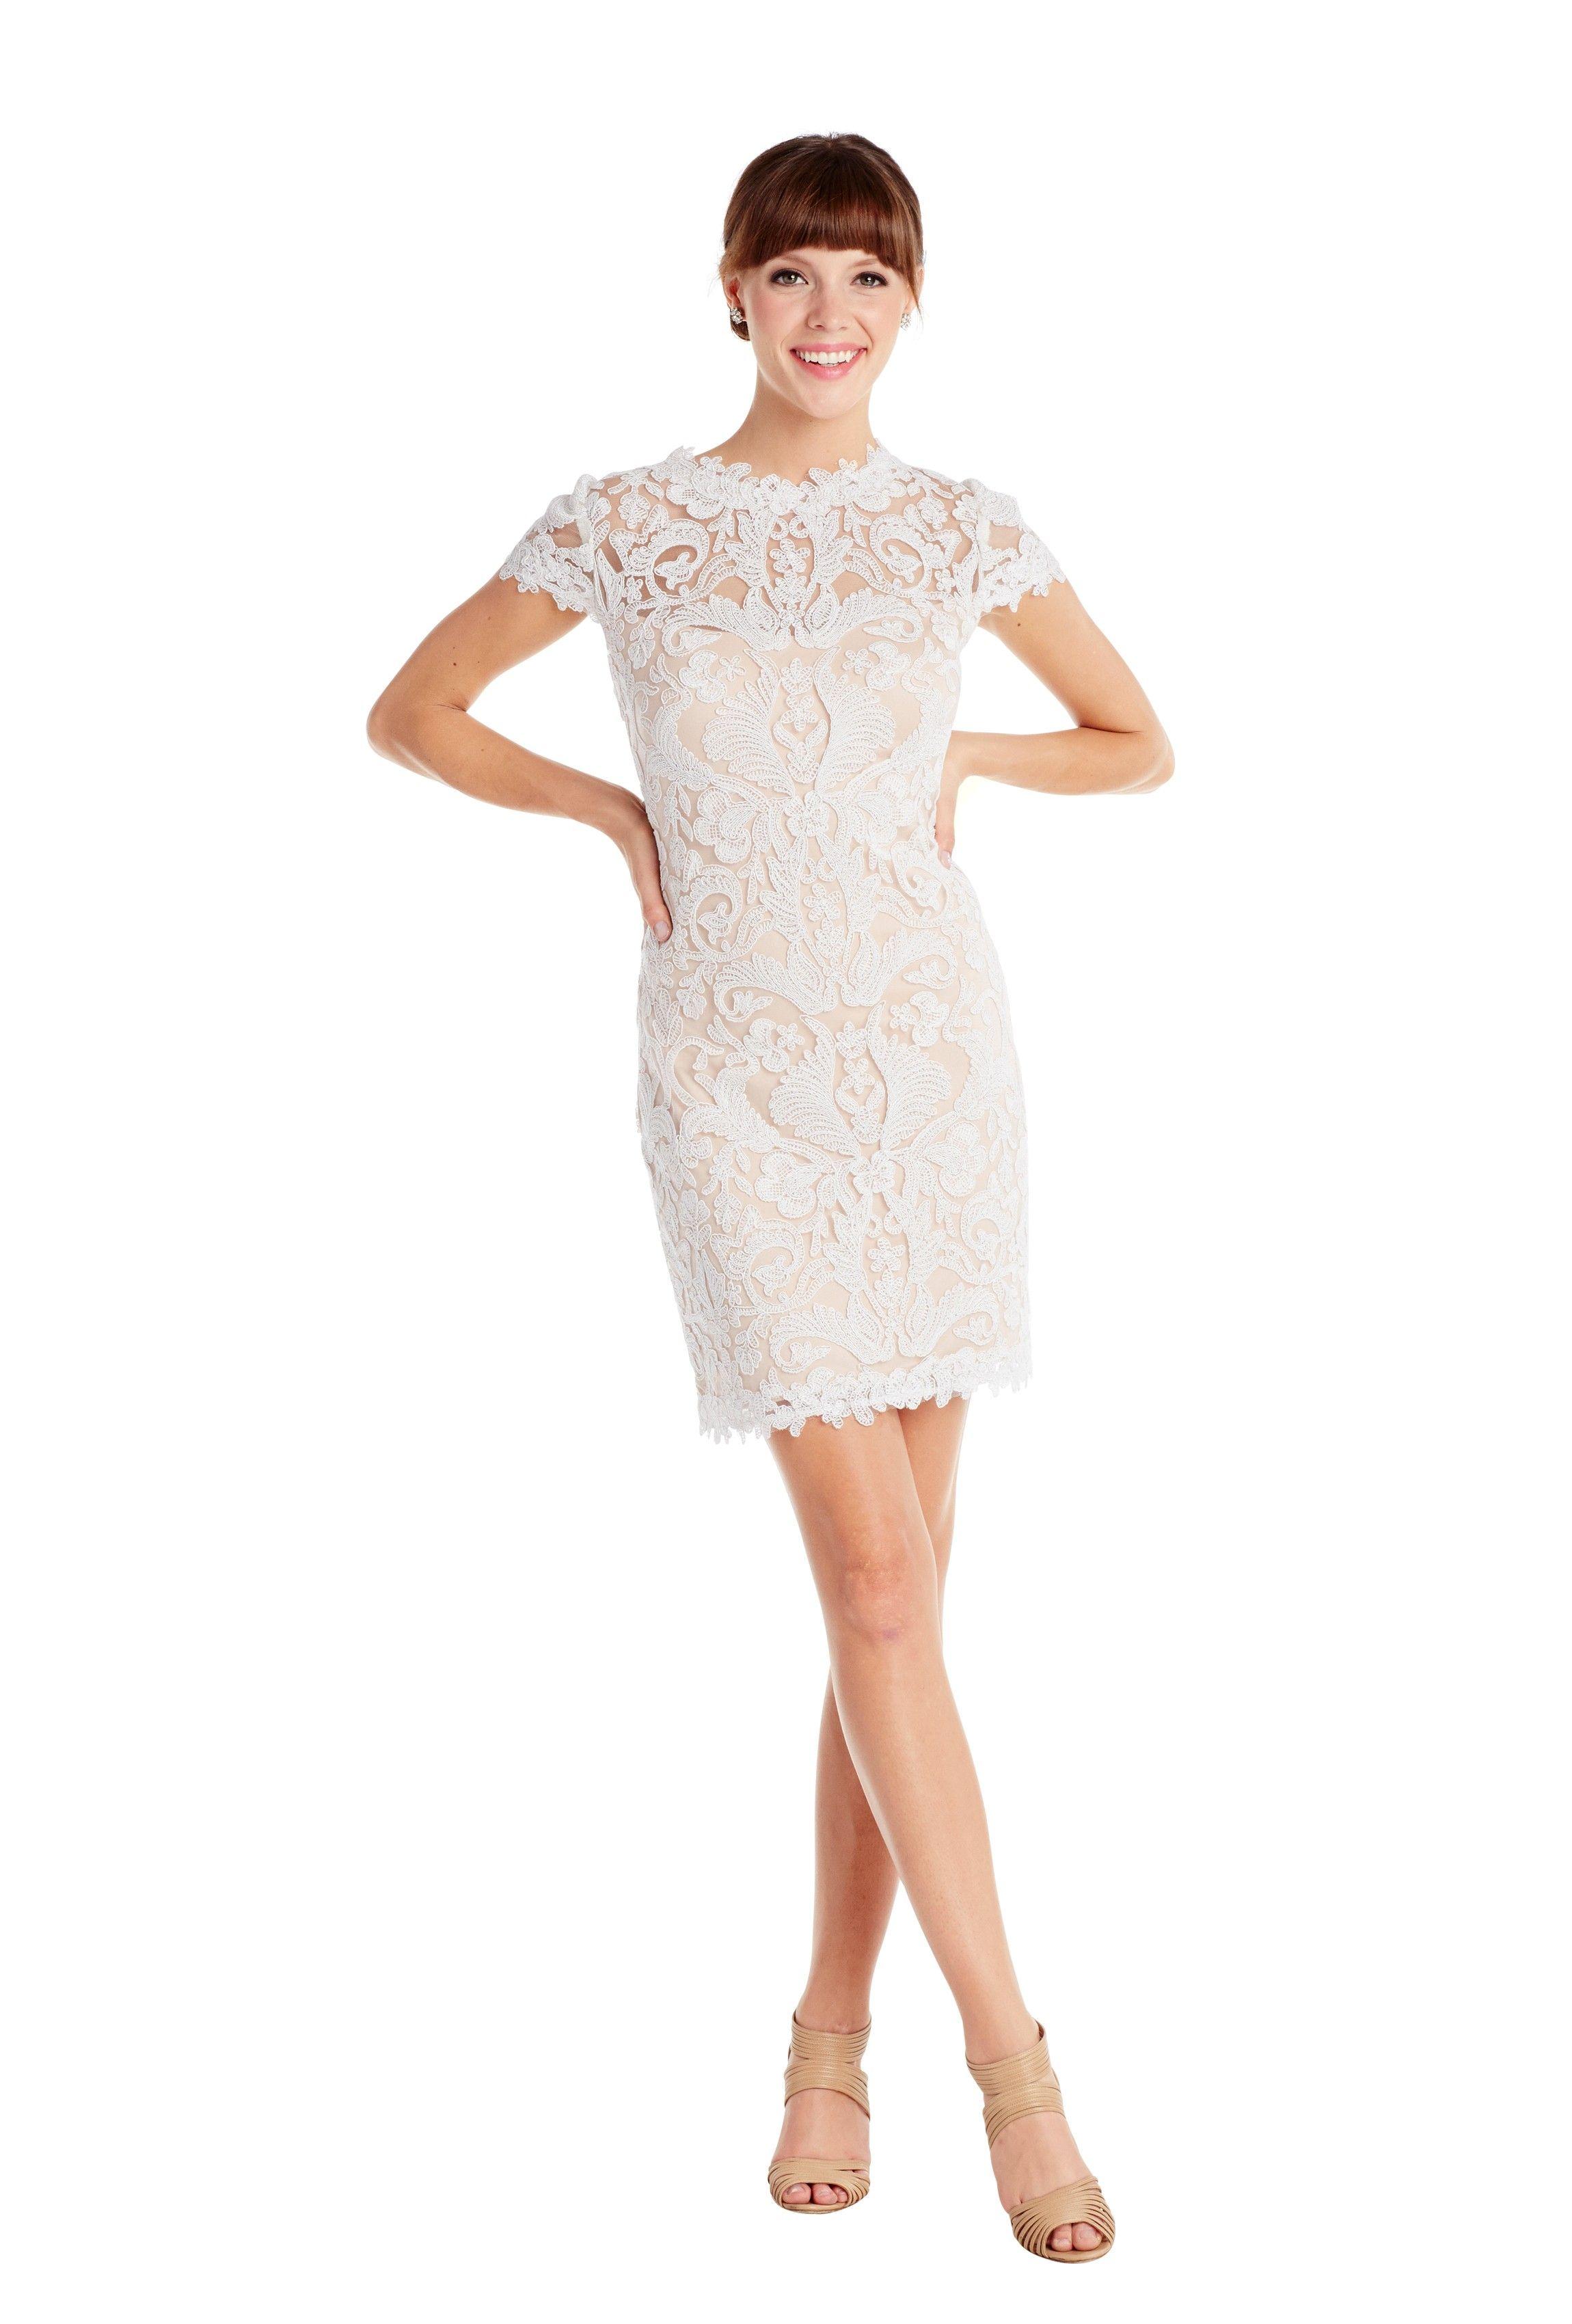 Ivory Lace Knee Length Dress Tadashi Shoji Lace Dress With Sleeves Little White Dresses Elegant Dresses [ 3400 x 2300 Pixel ]